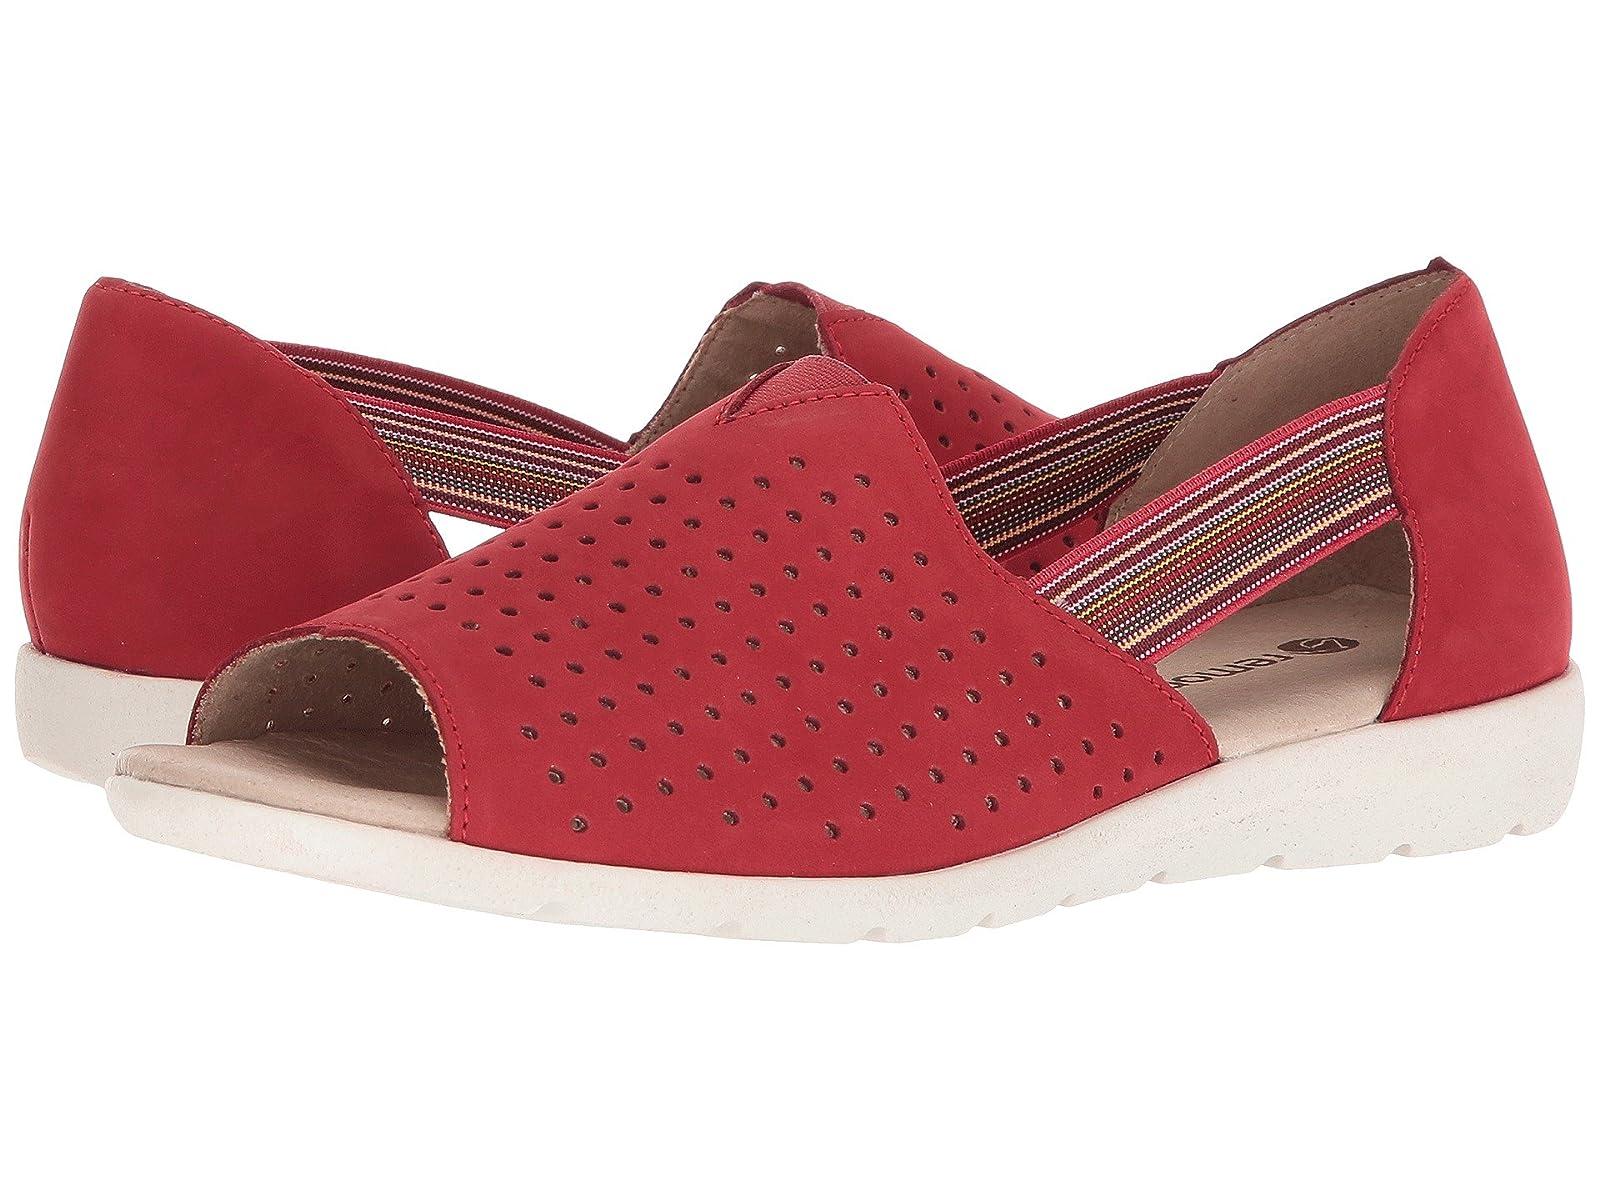 Rieker D1923 Malea 23Atmospheric grades have affordable shoes